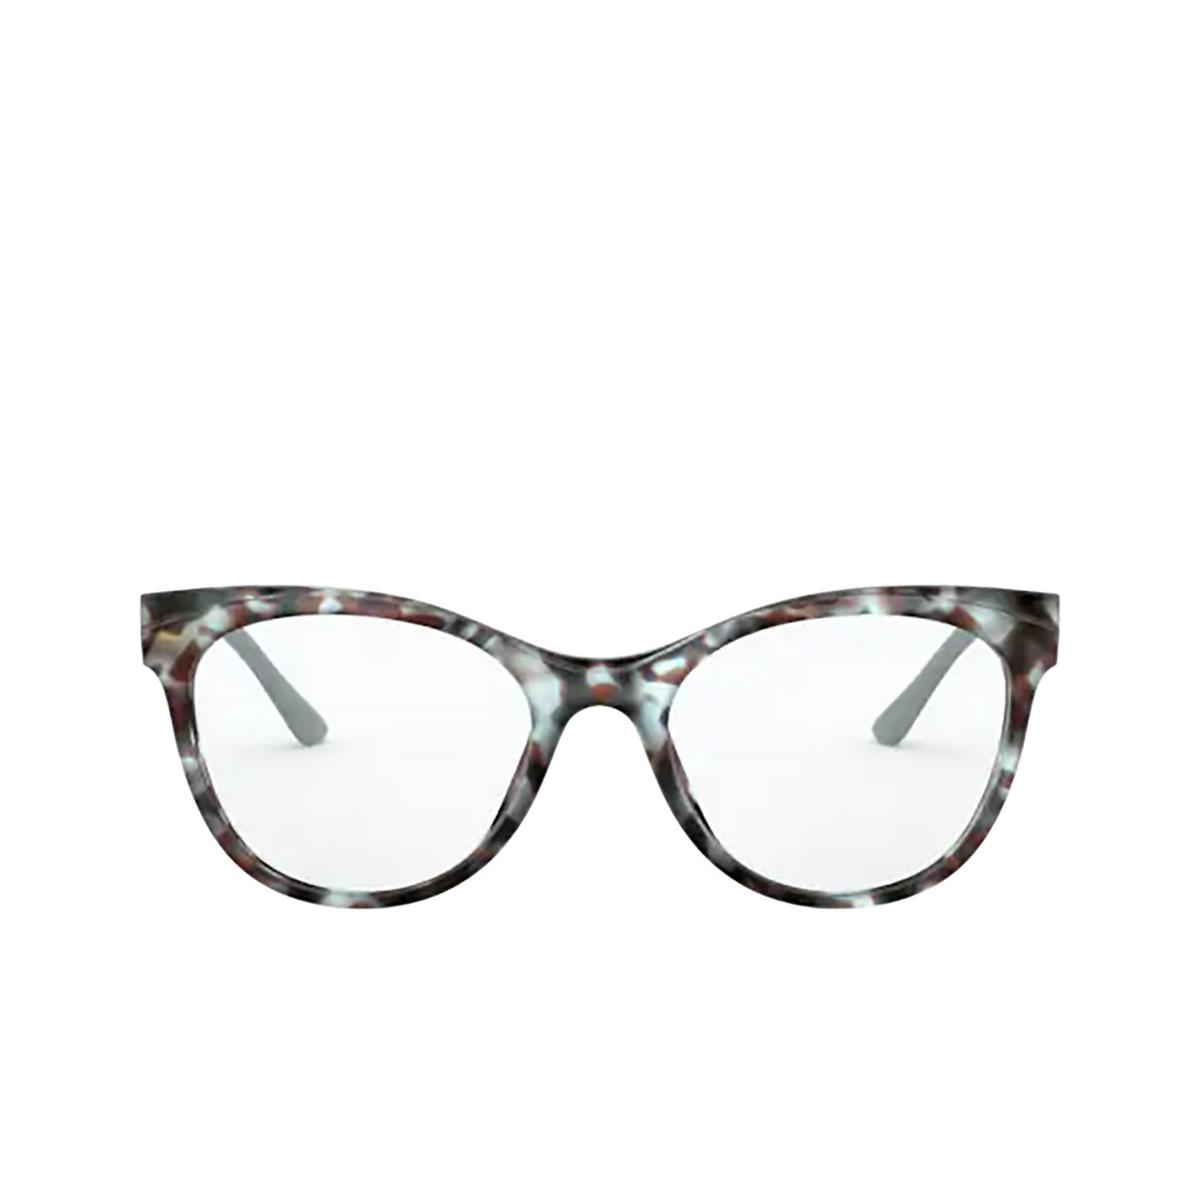 Prada® Butterfly Eyeglasses: PR 05WV color Blue / Brown 05H1O1 - front view.